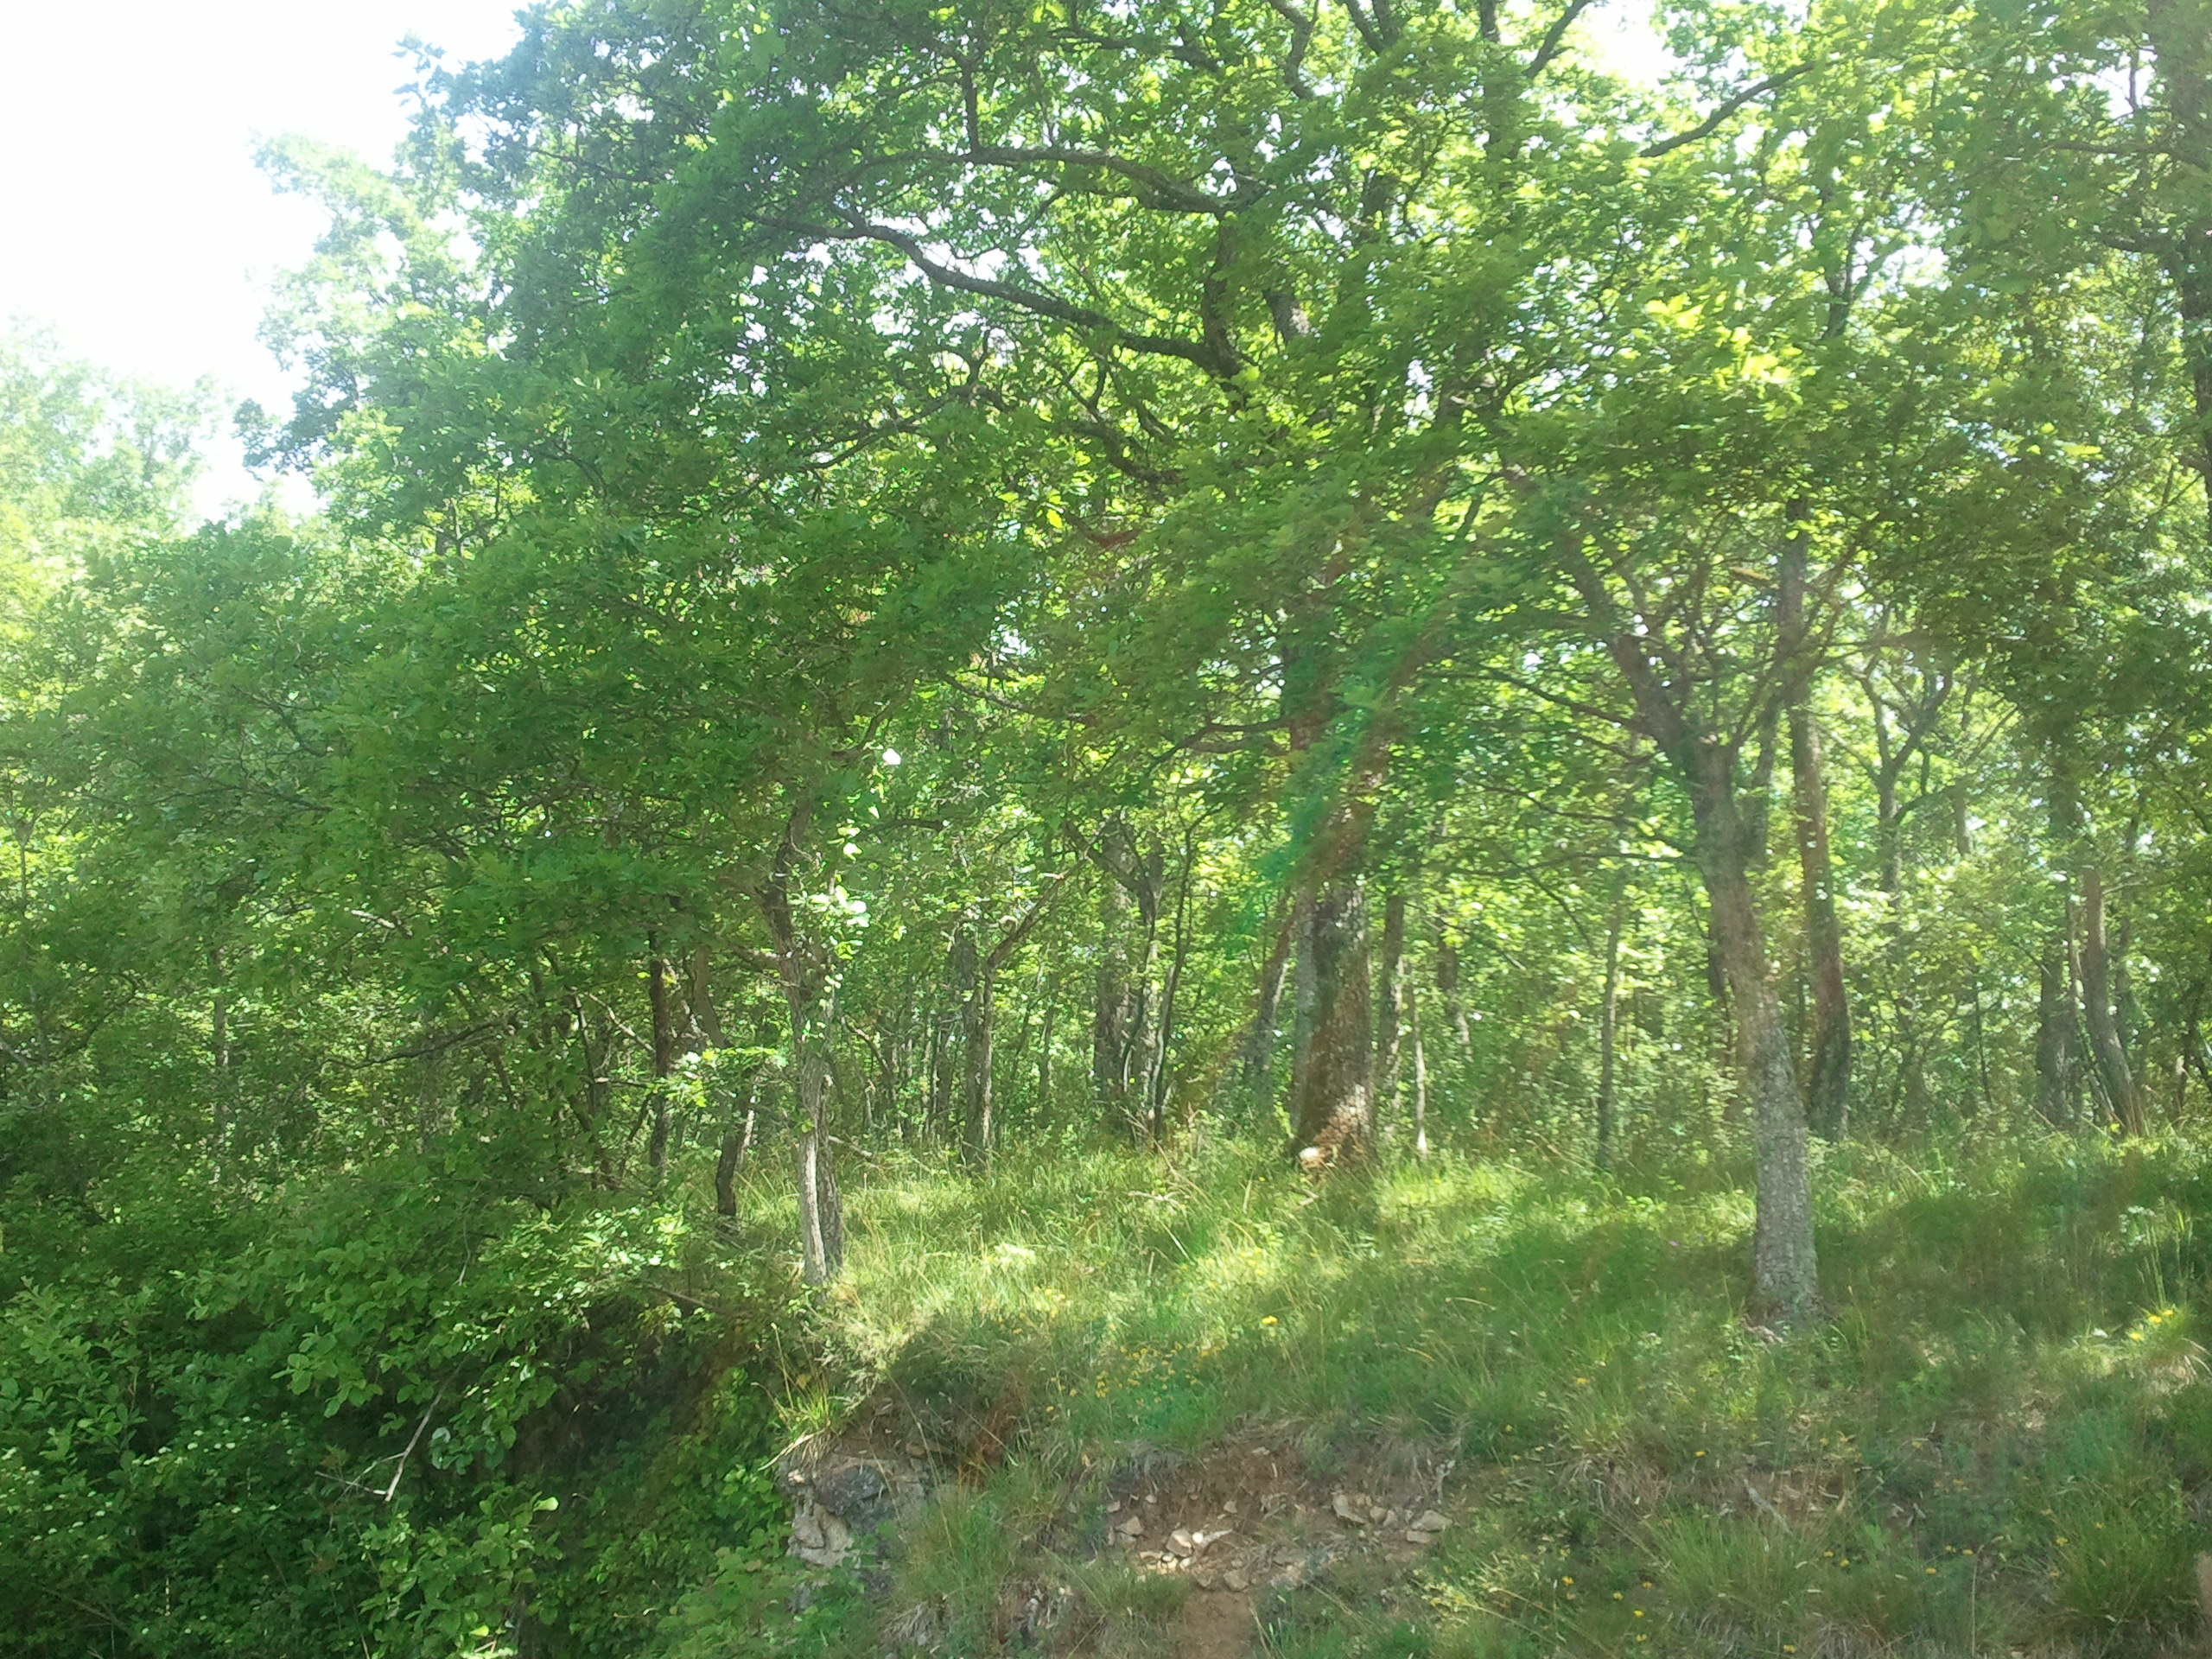 https://cdnfiles1.biolovision.net/www.faune-alsace.org/userfiles/Insectes/cigales/Cicadettamontana-Osenbach-20140522.jpg